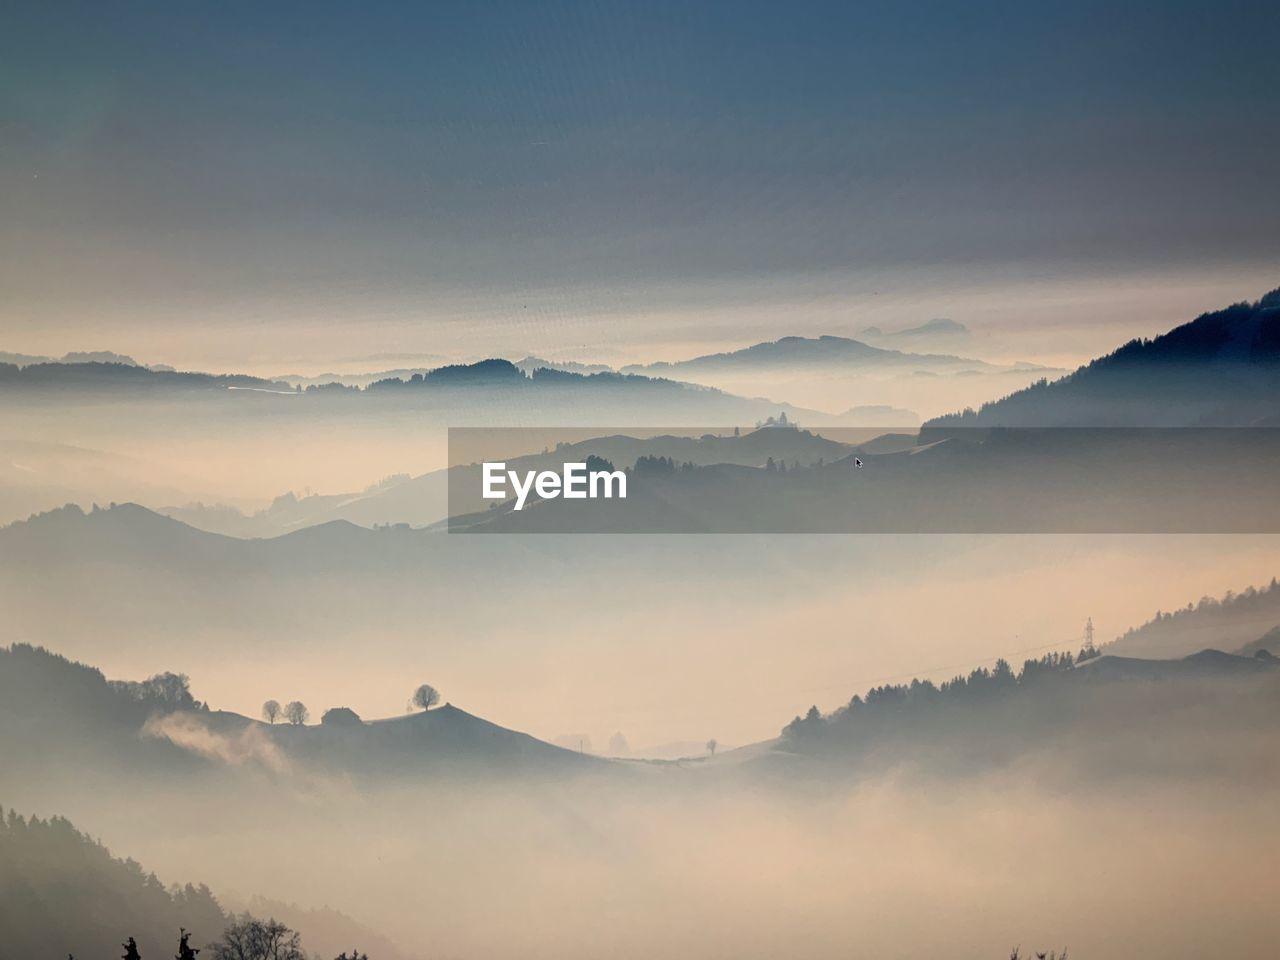 mountain, scenics - nature, beauty in nature, tranquil scene, fog, tranquility, mountain range, sky, idyllic, non-urban scene, environment, no people, nature, hazy, majestic, sunset, landscape, remote, outdoors, mountain peak